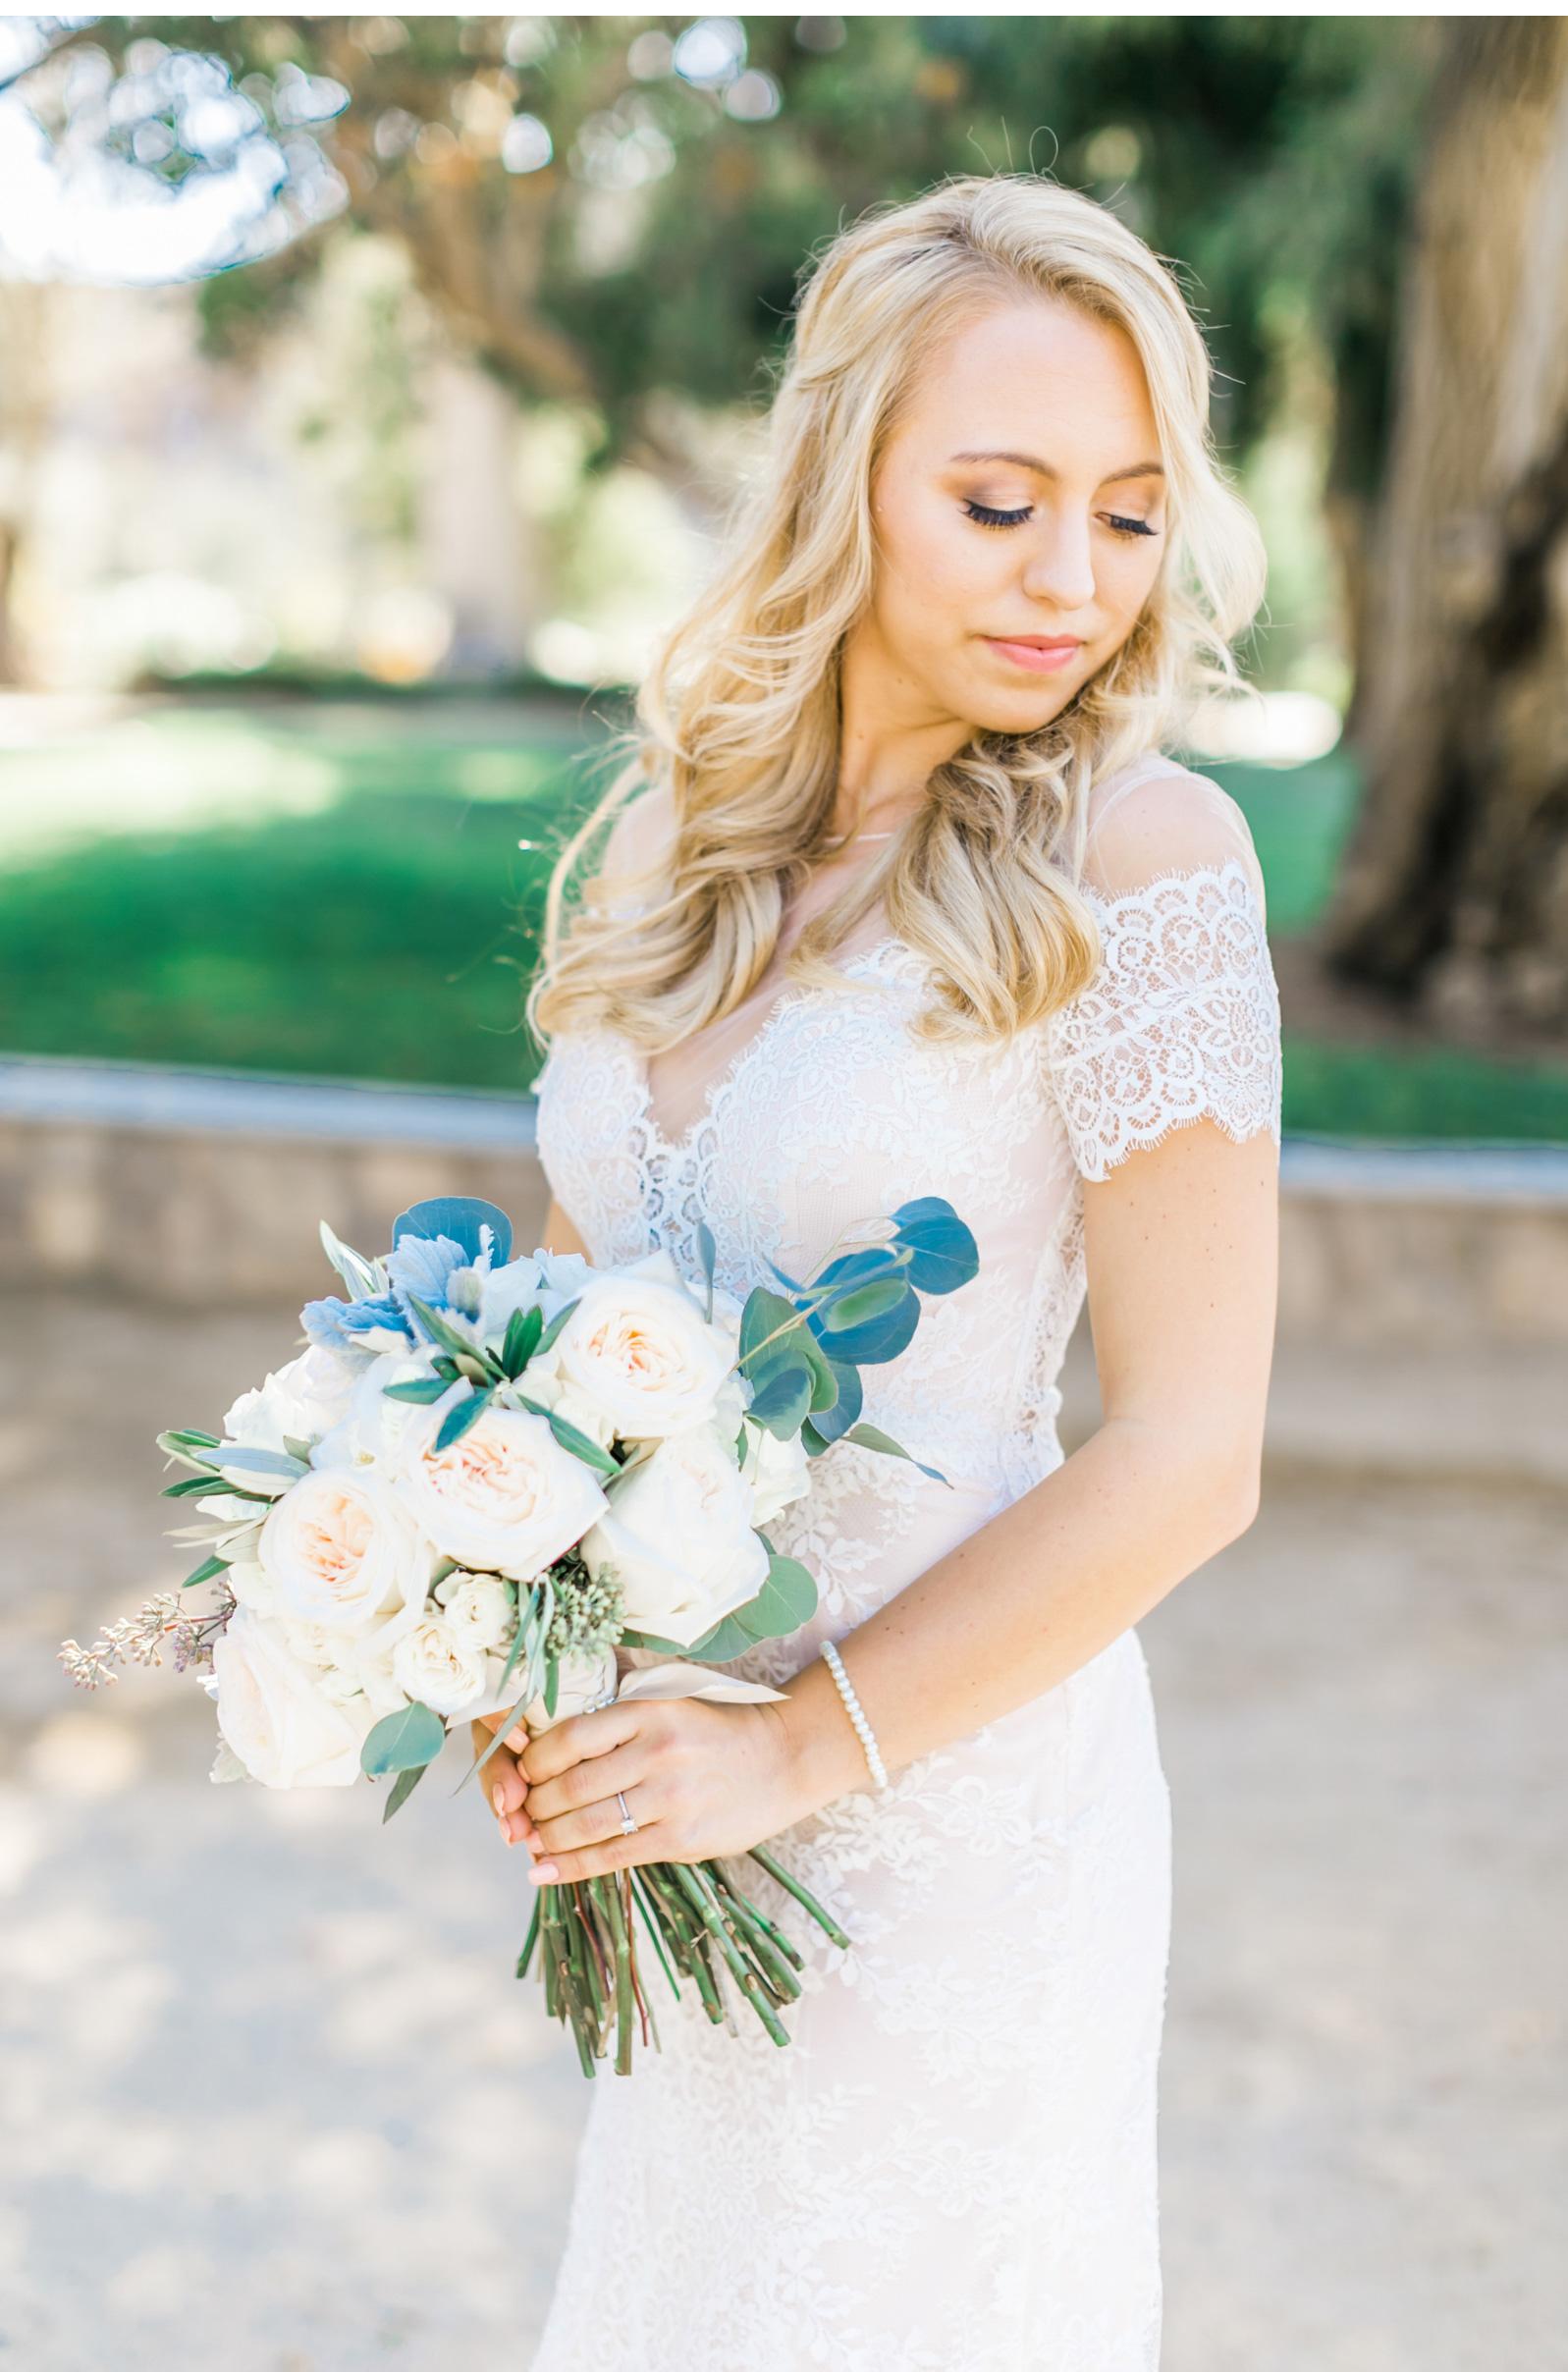 Temecula-Wedding-Photographer-Style-Me-Pretty-Natalie-Schutt-Photography_16.jpg